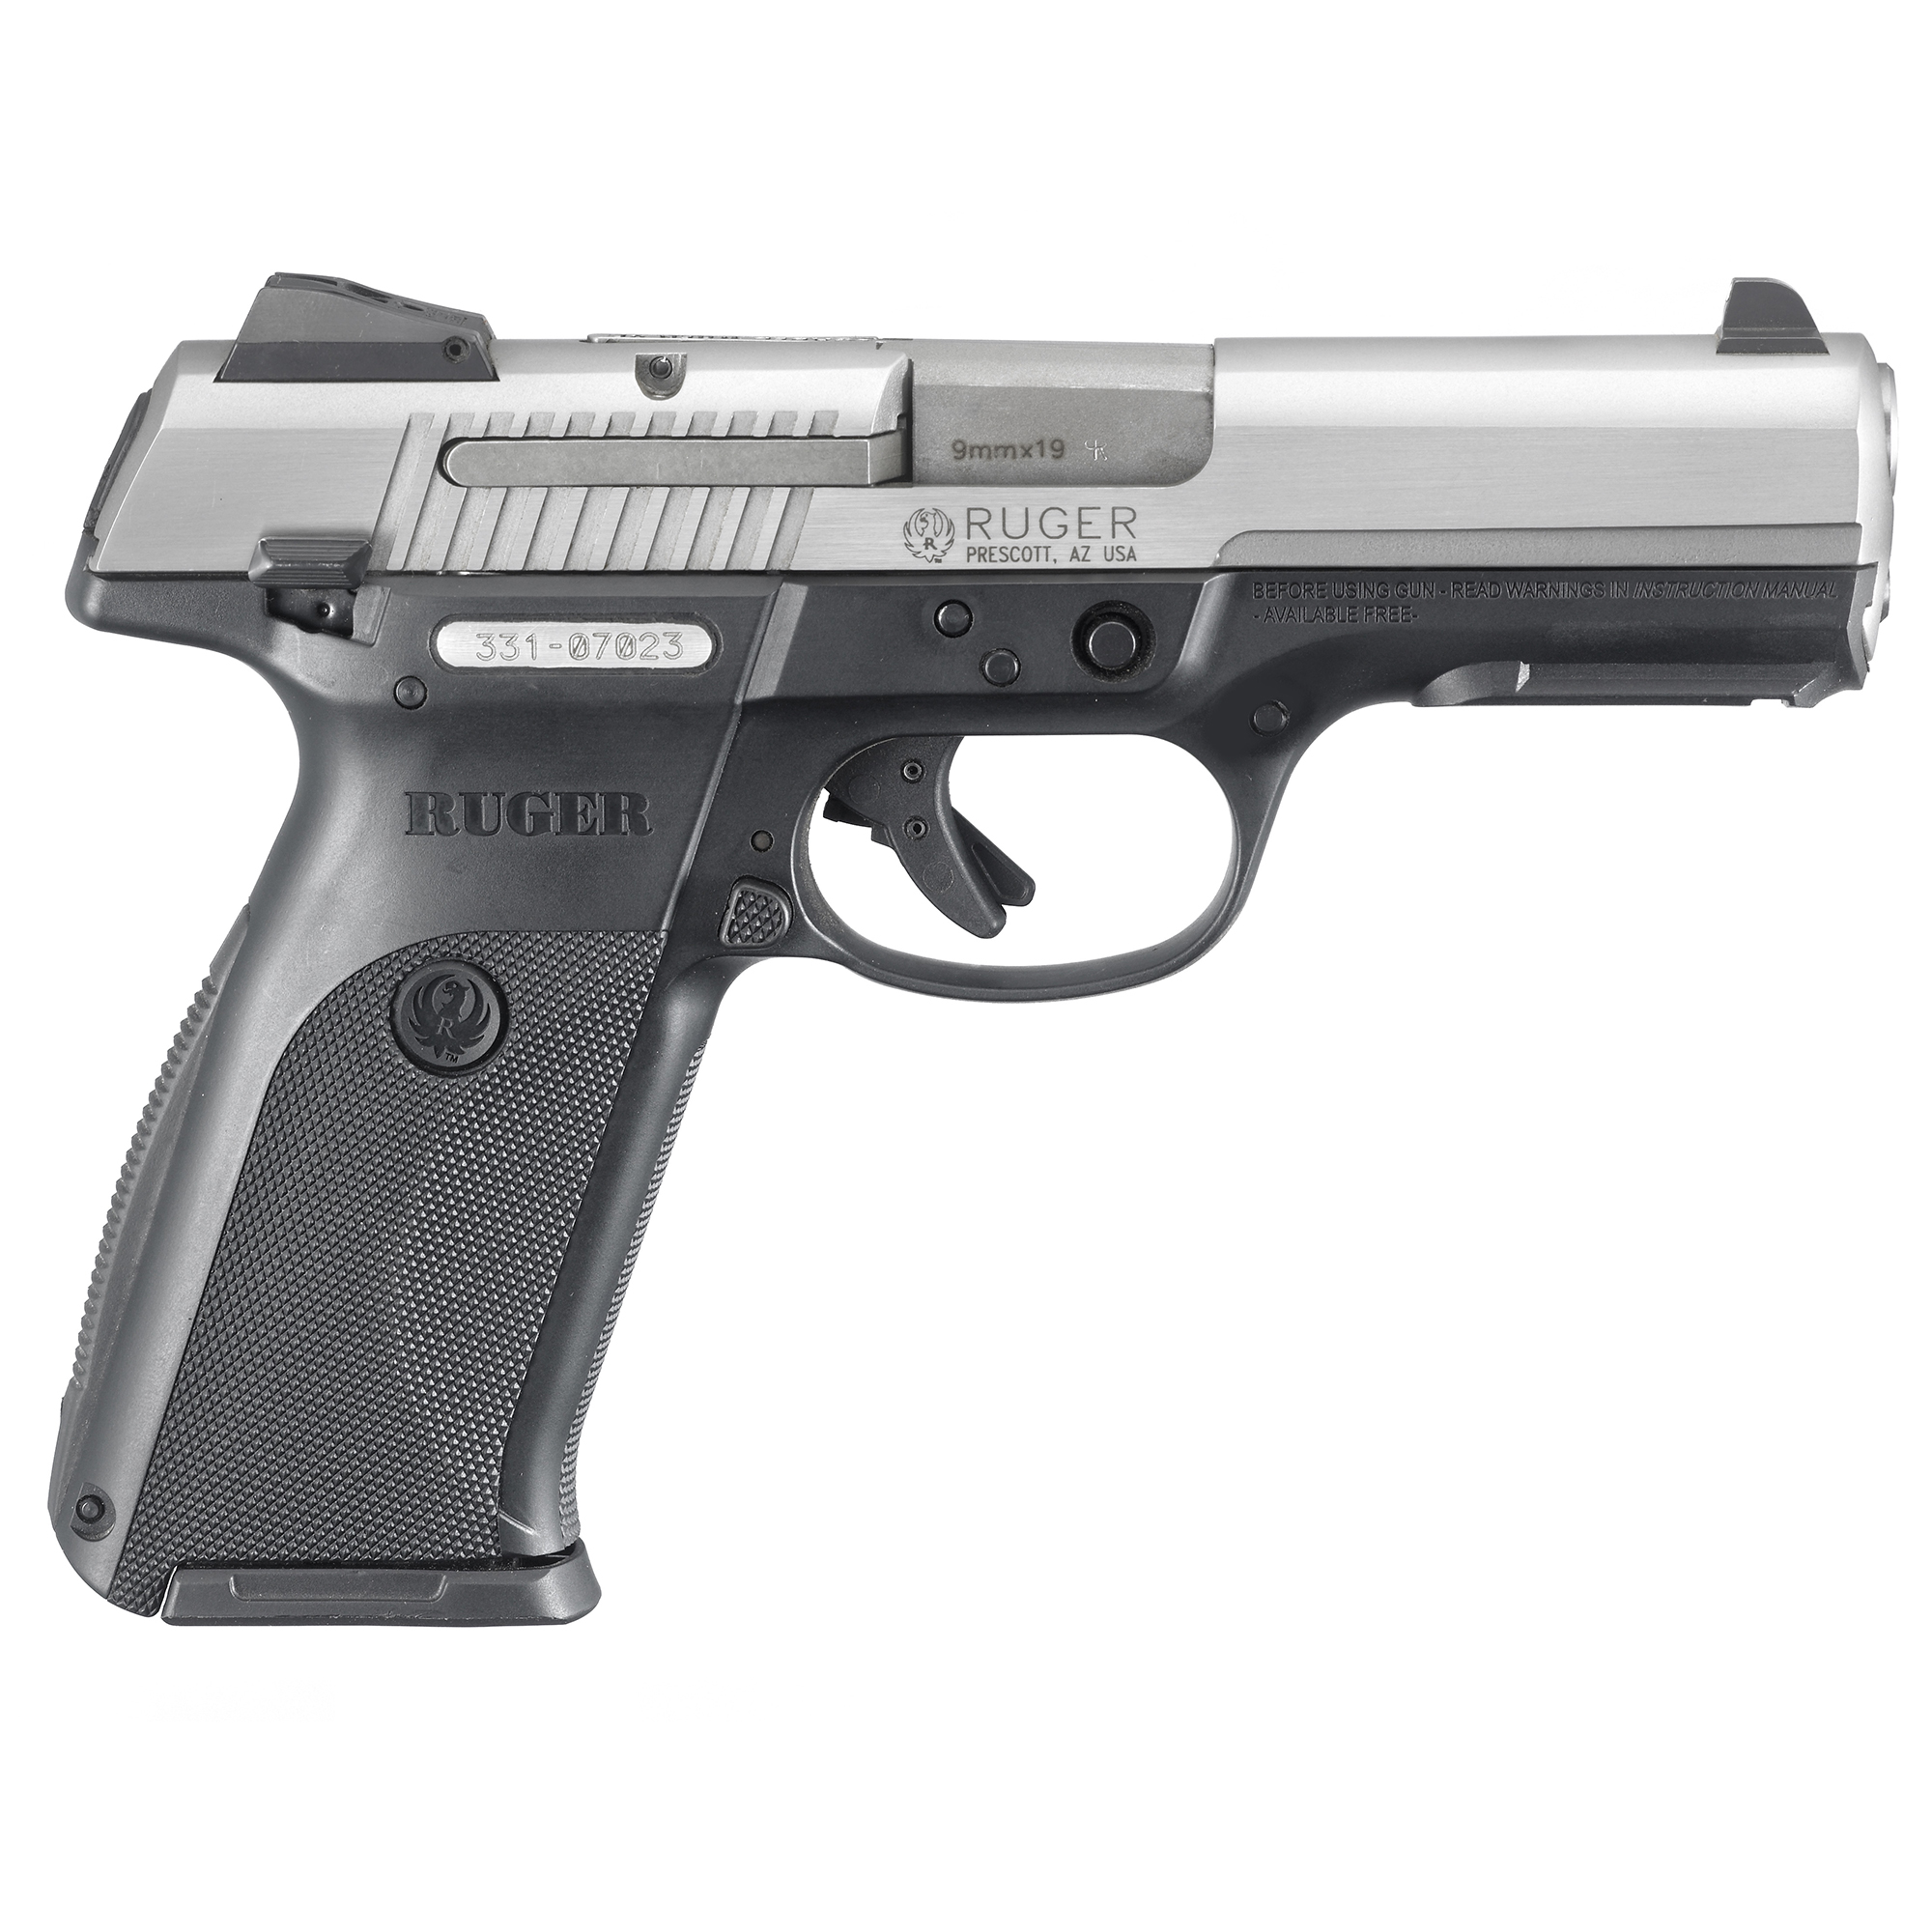 Ruger SR9 Handgun